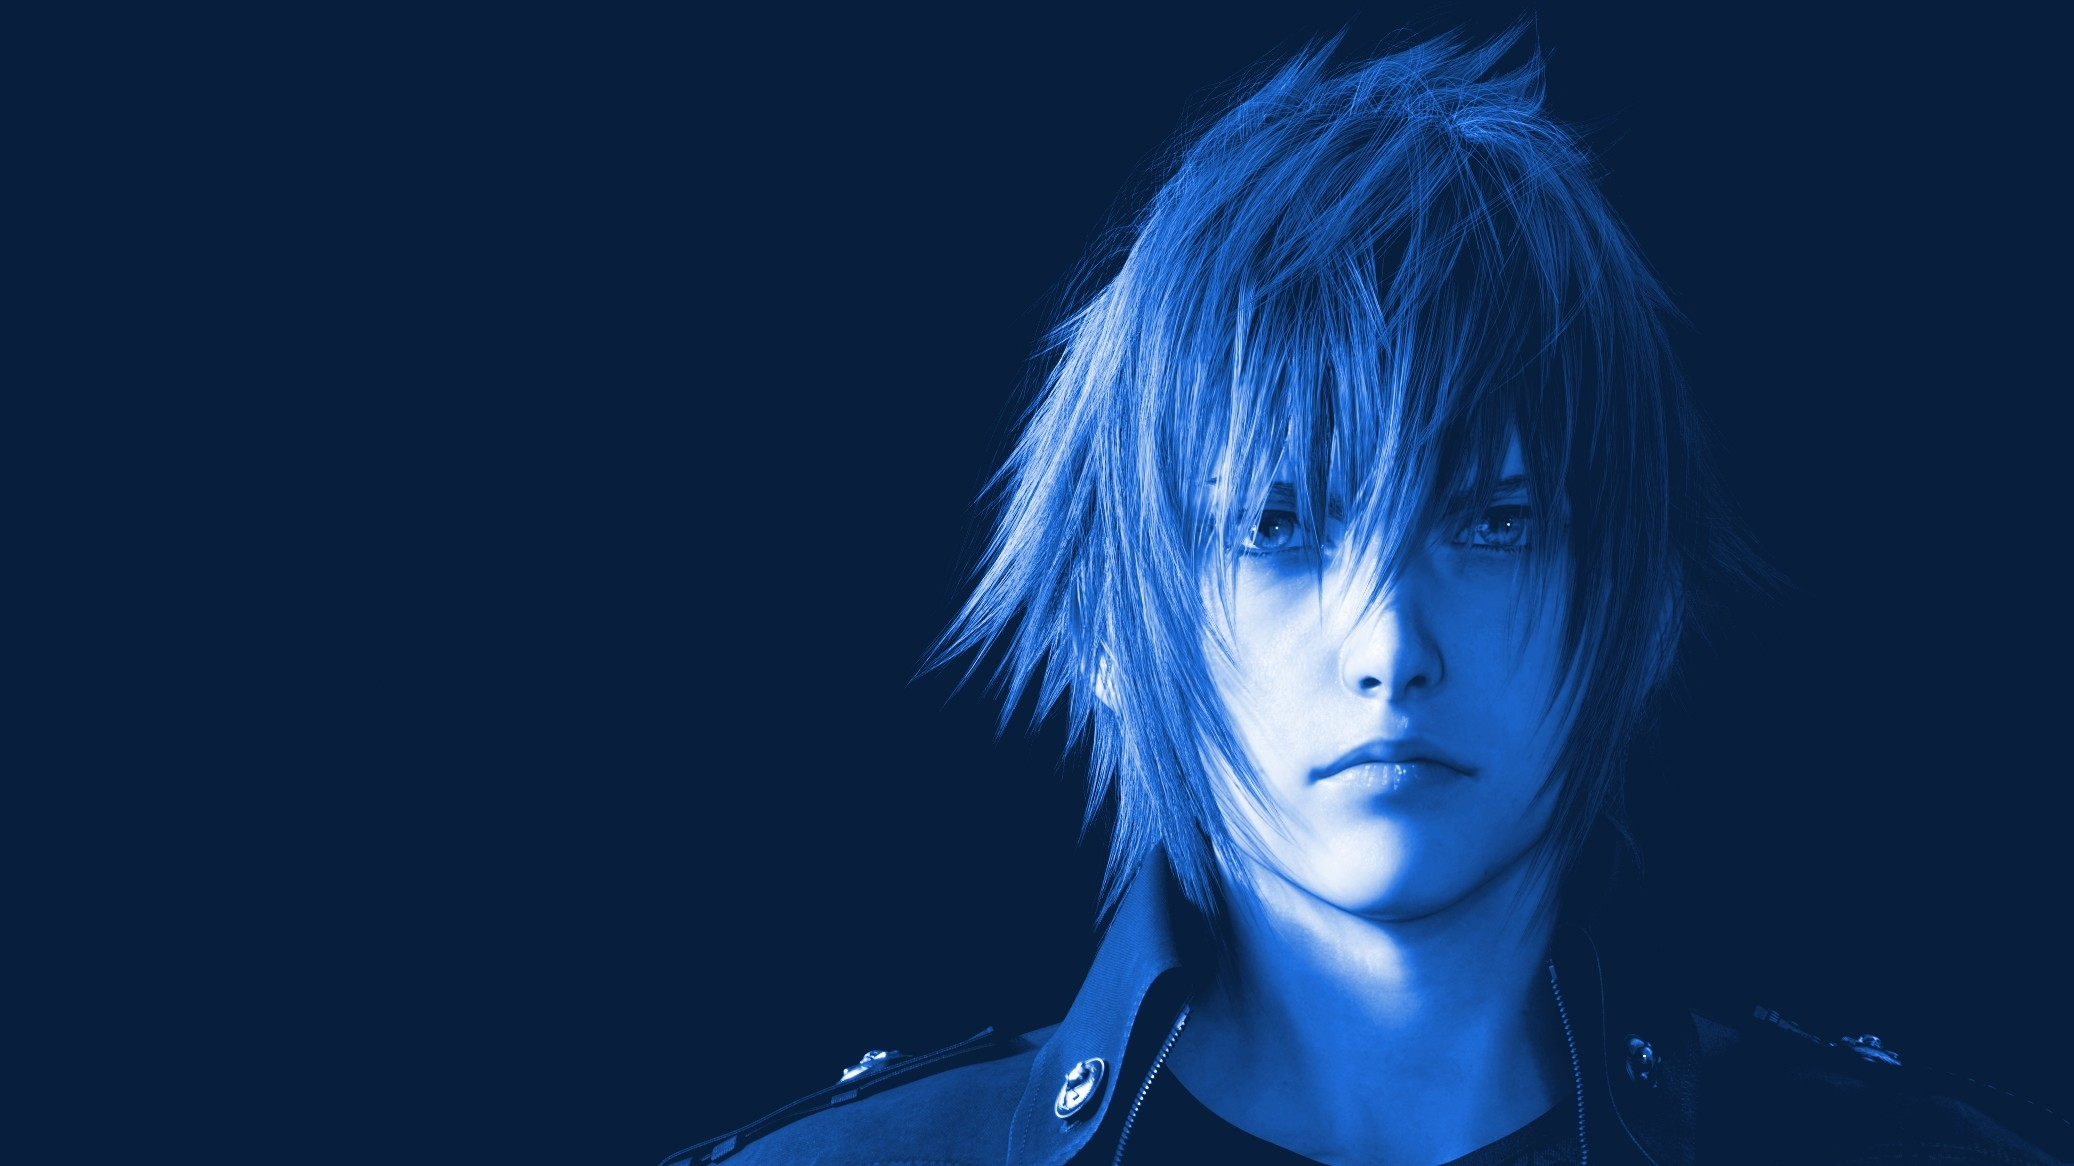 Final Fantasy XV Lunafreya Nox Fleuret Noctis Lucis Caelum · HD Wallpaper    Background ID:778472